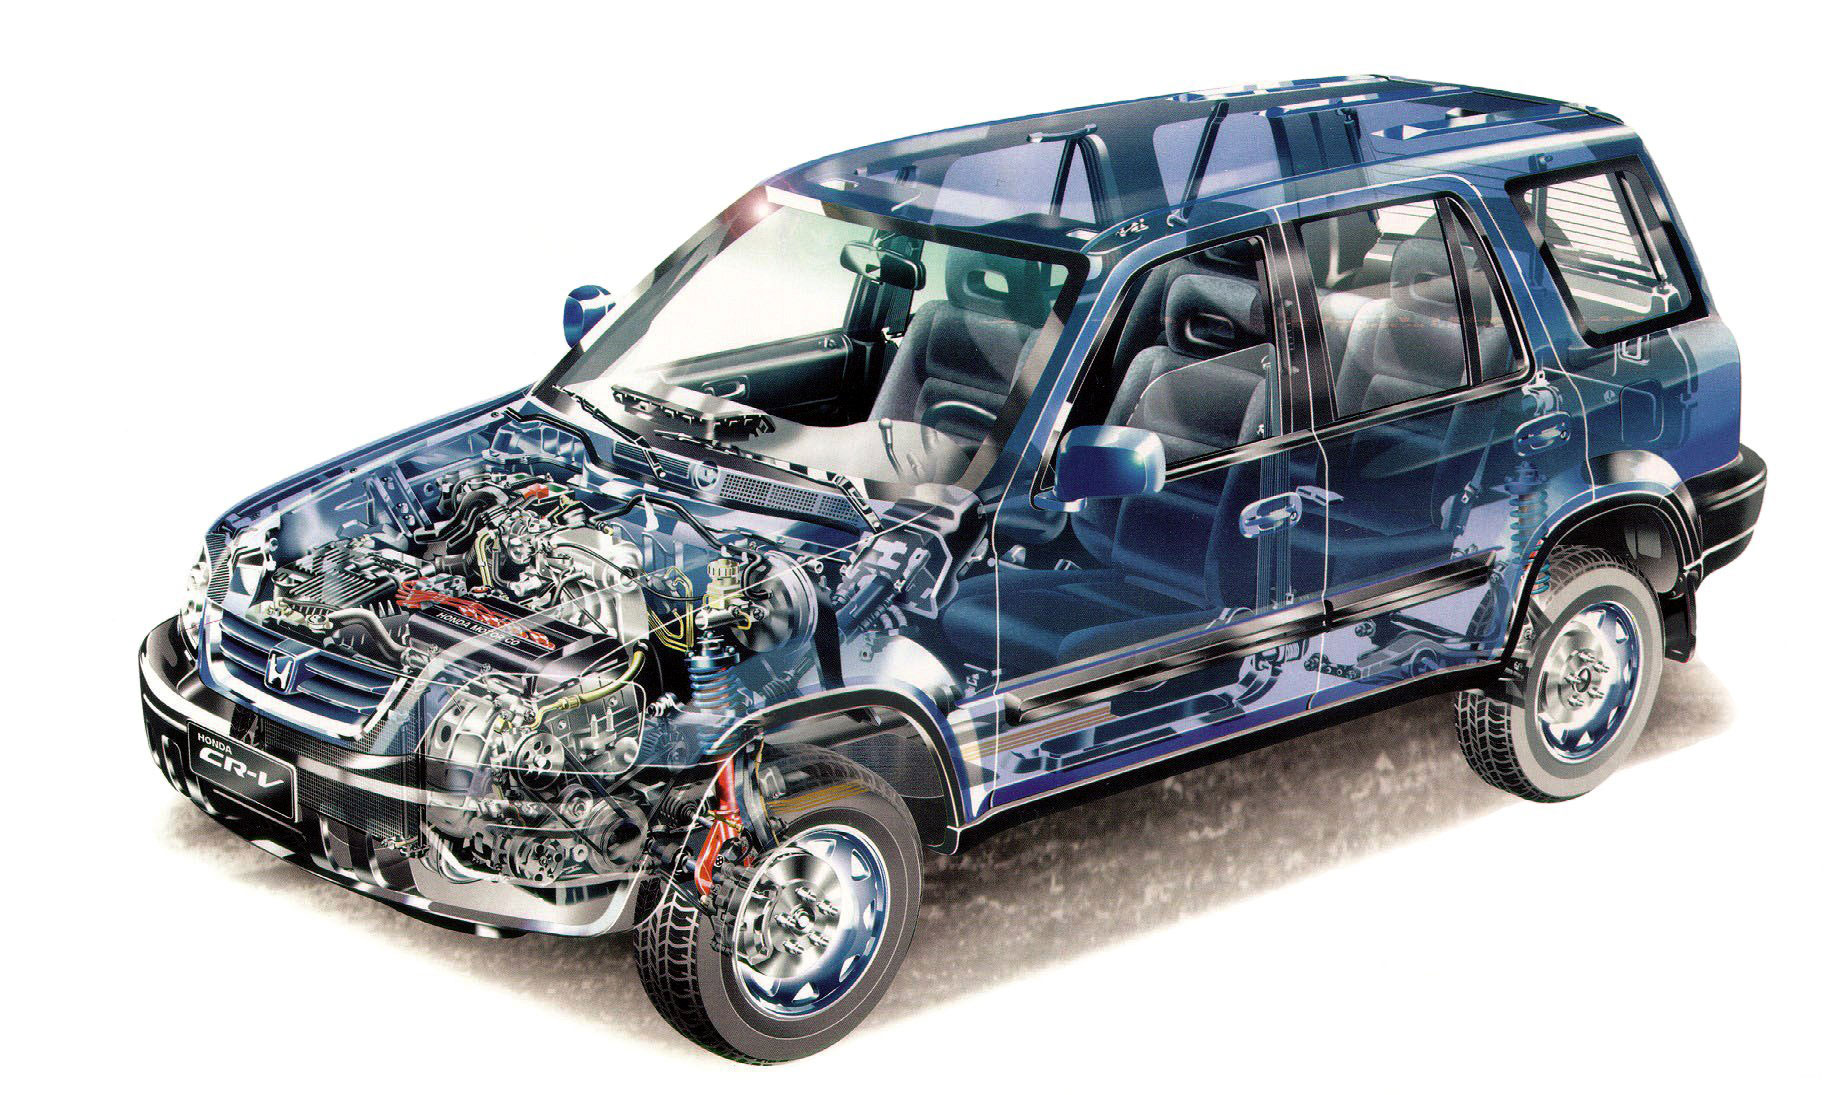 Honda CR-V 1996 cutaway drawing